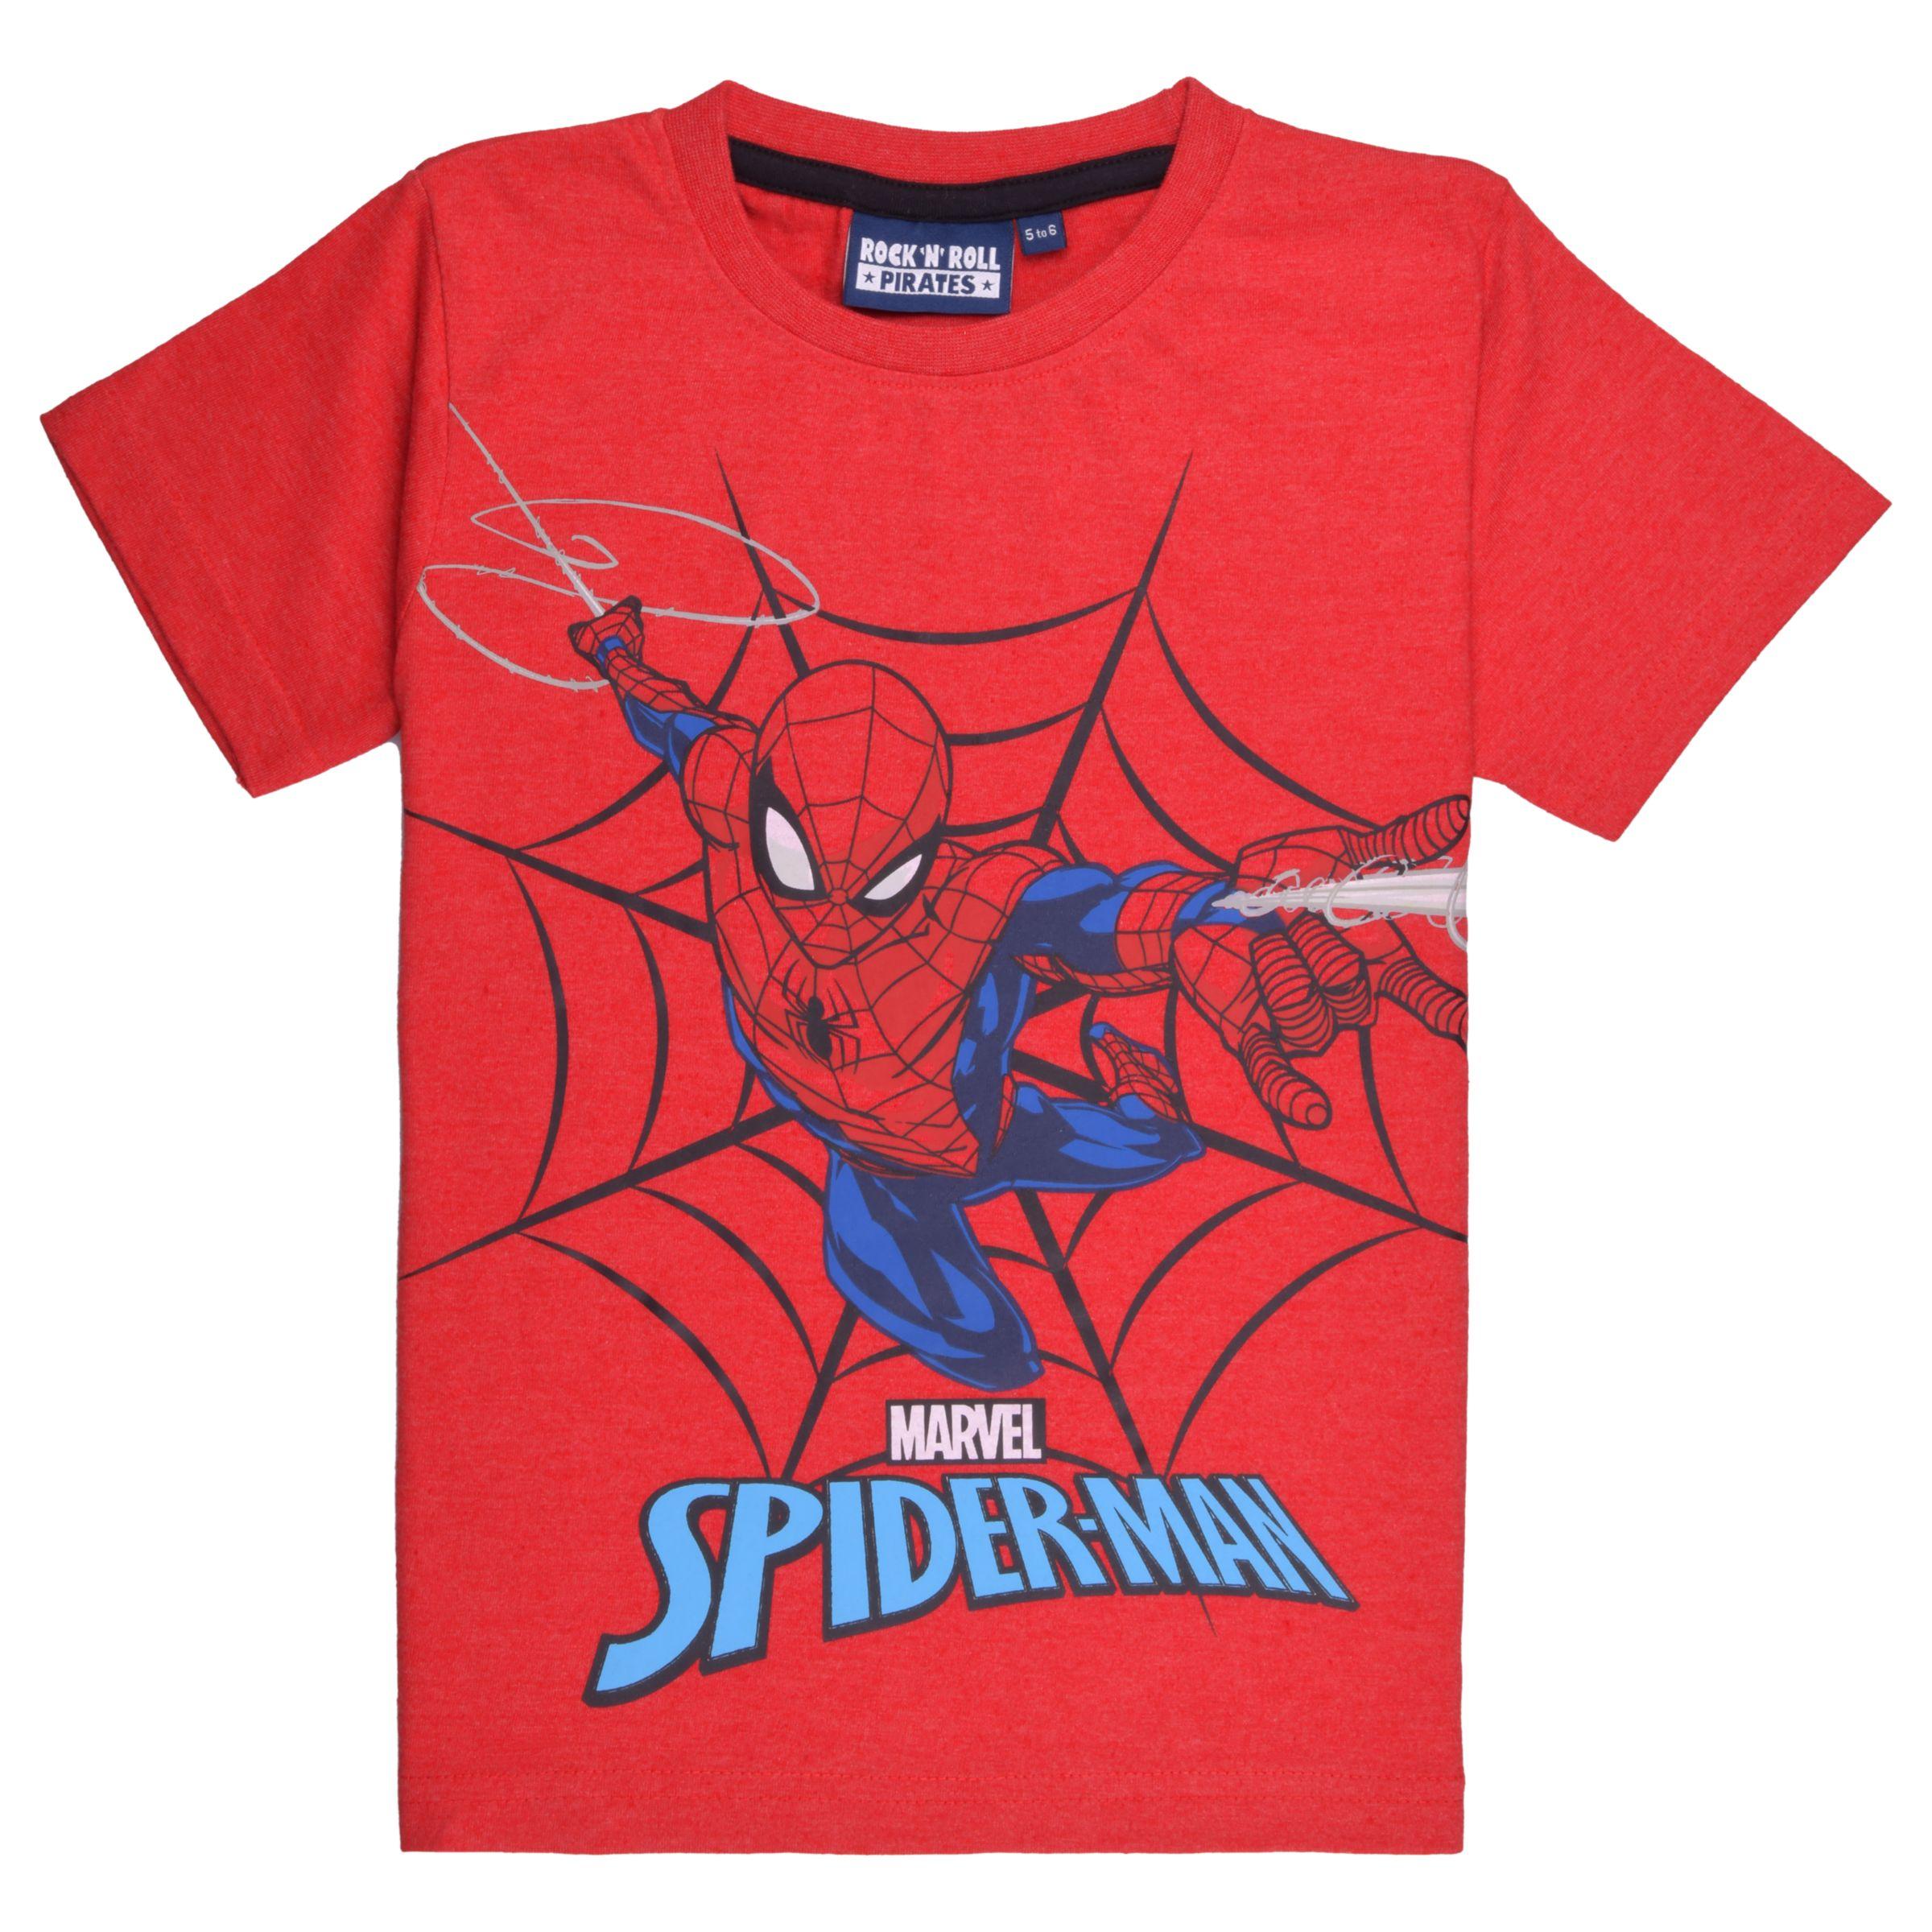 bb6d9a2d Spider-Man Boys' Short Sleeve T-Shirt, Red at John Lewis & Partners